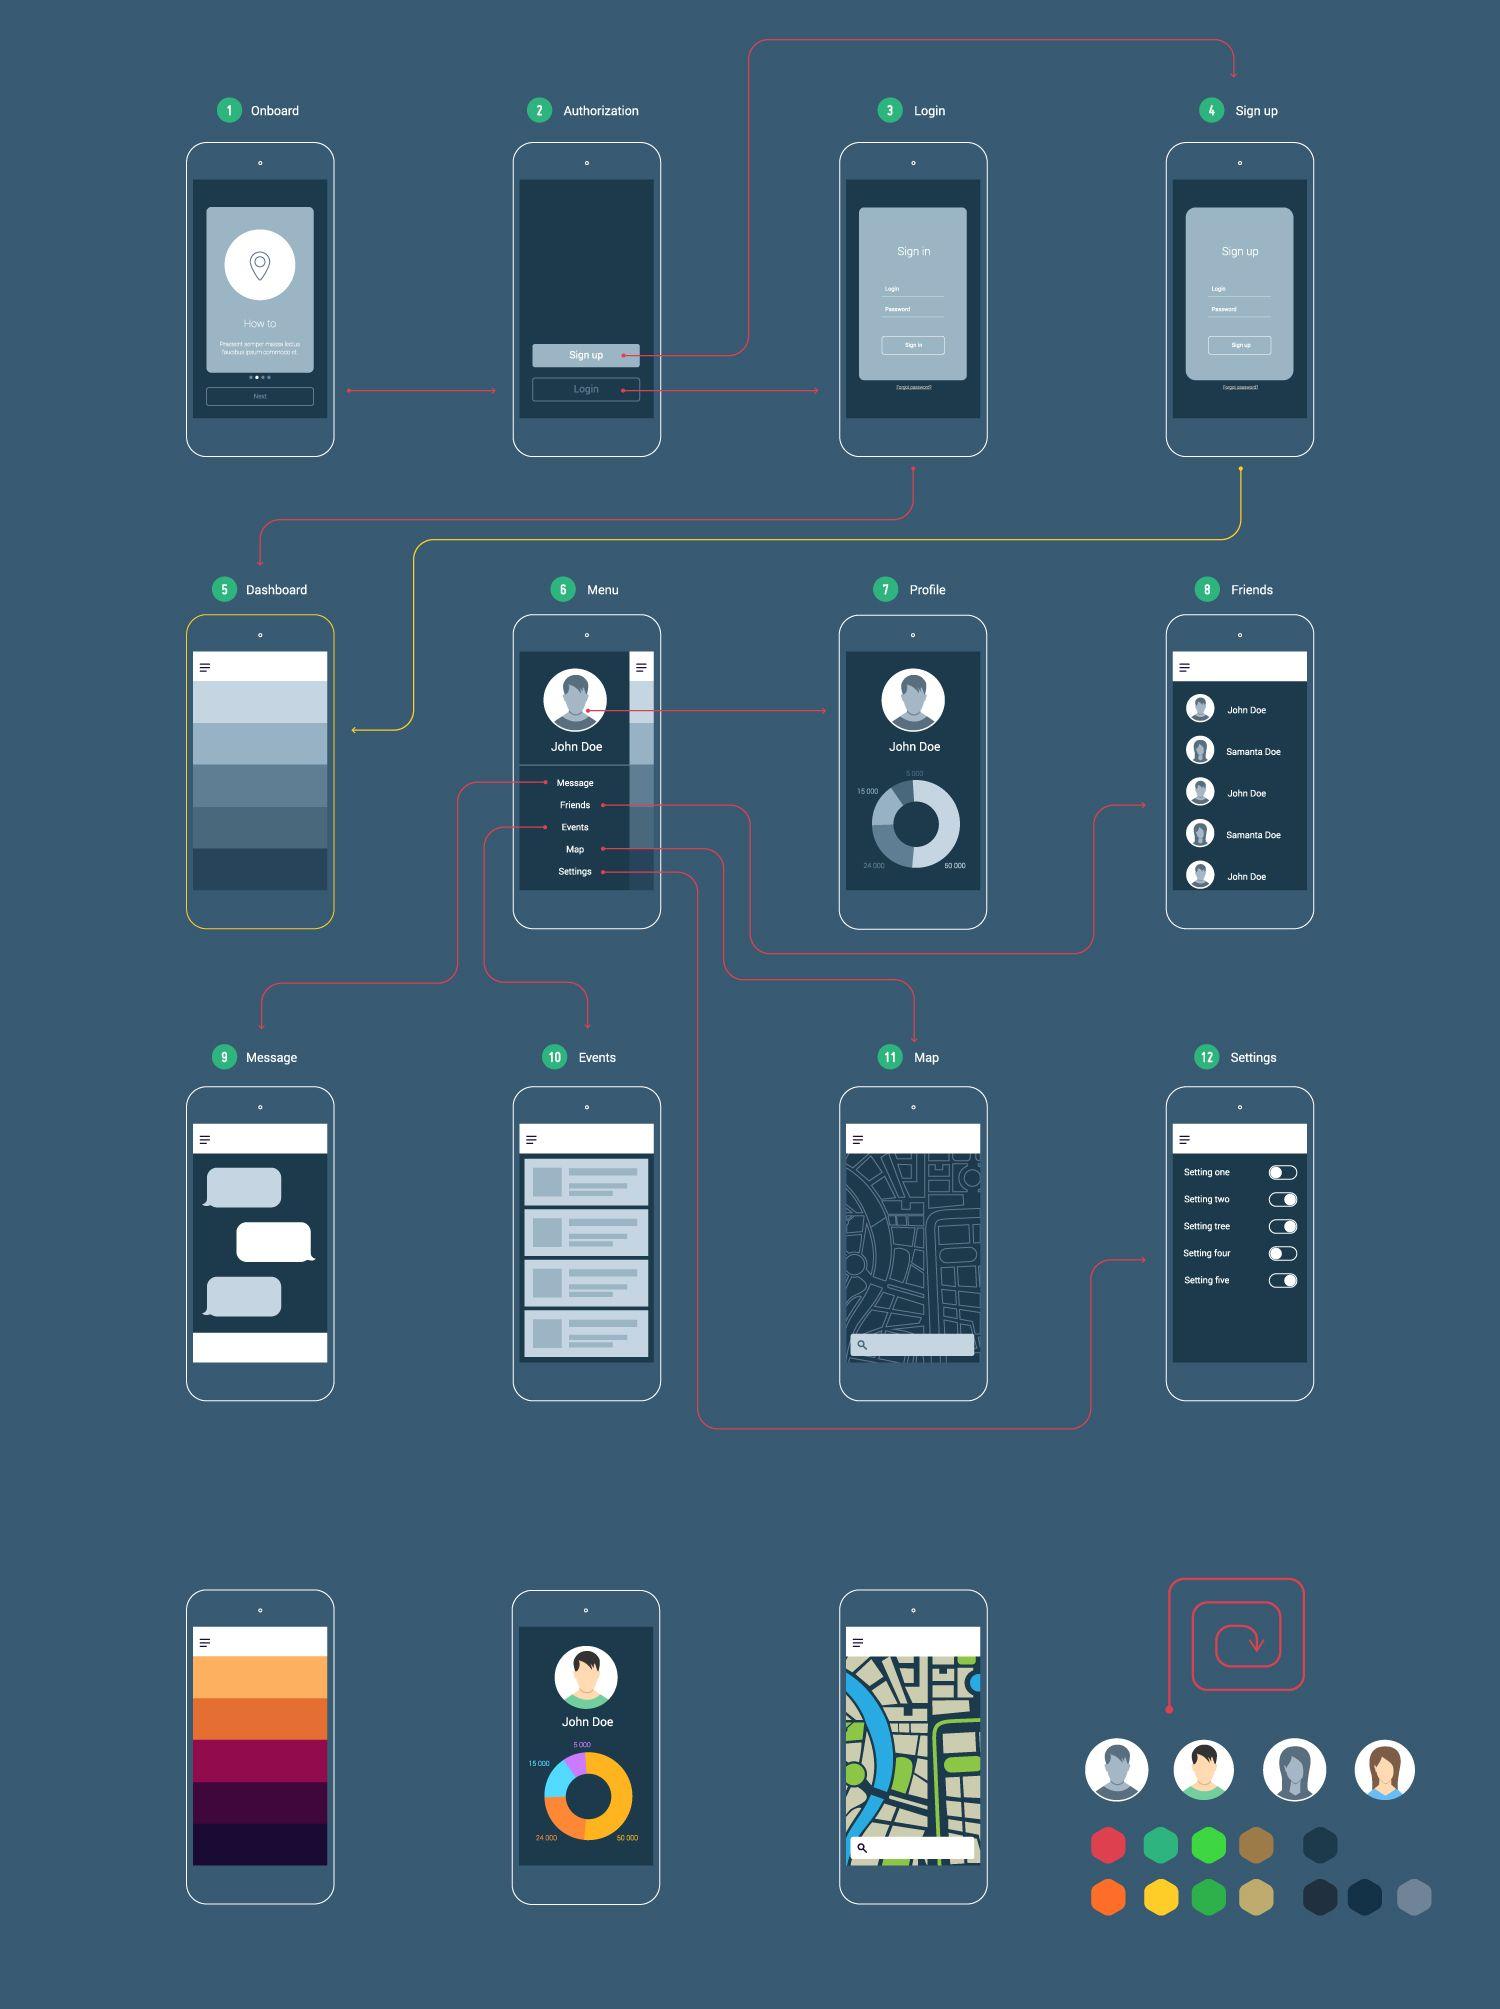 css ux dashboard coding wireframe mobile ui app screen kit template phone design. Black Bedroom Furniture Sets. Home Design Ideas